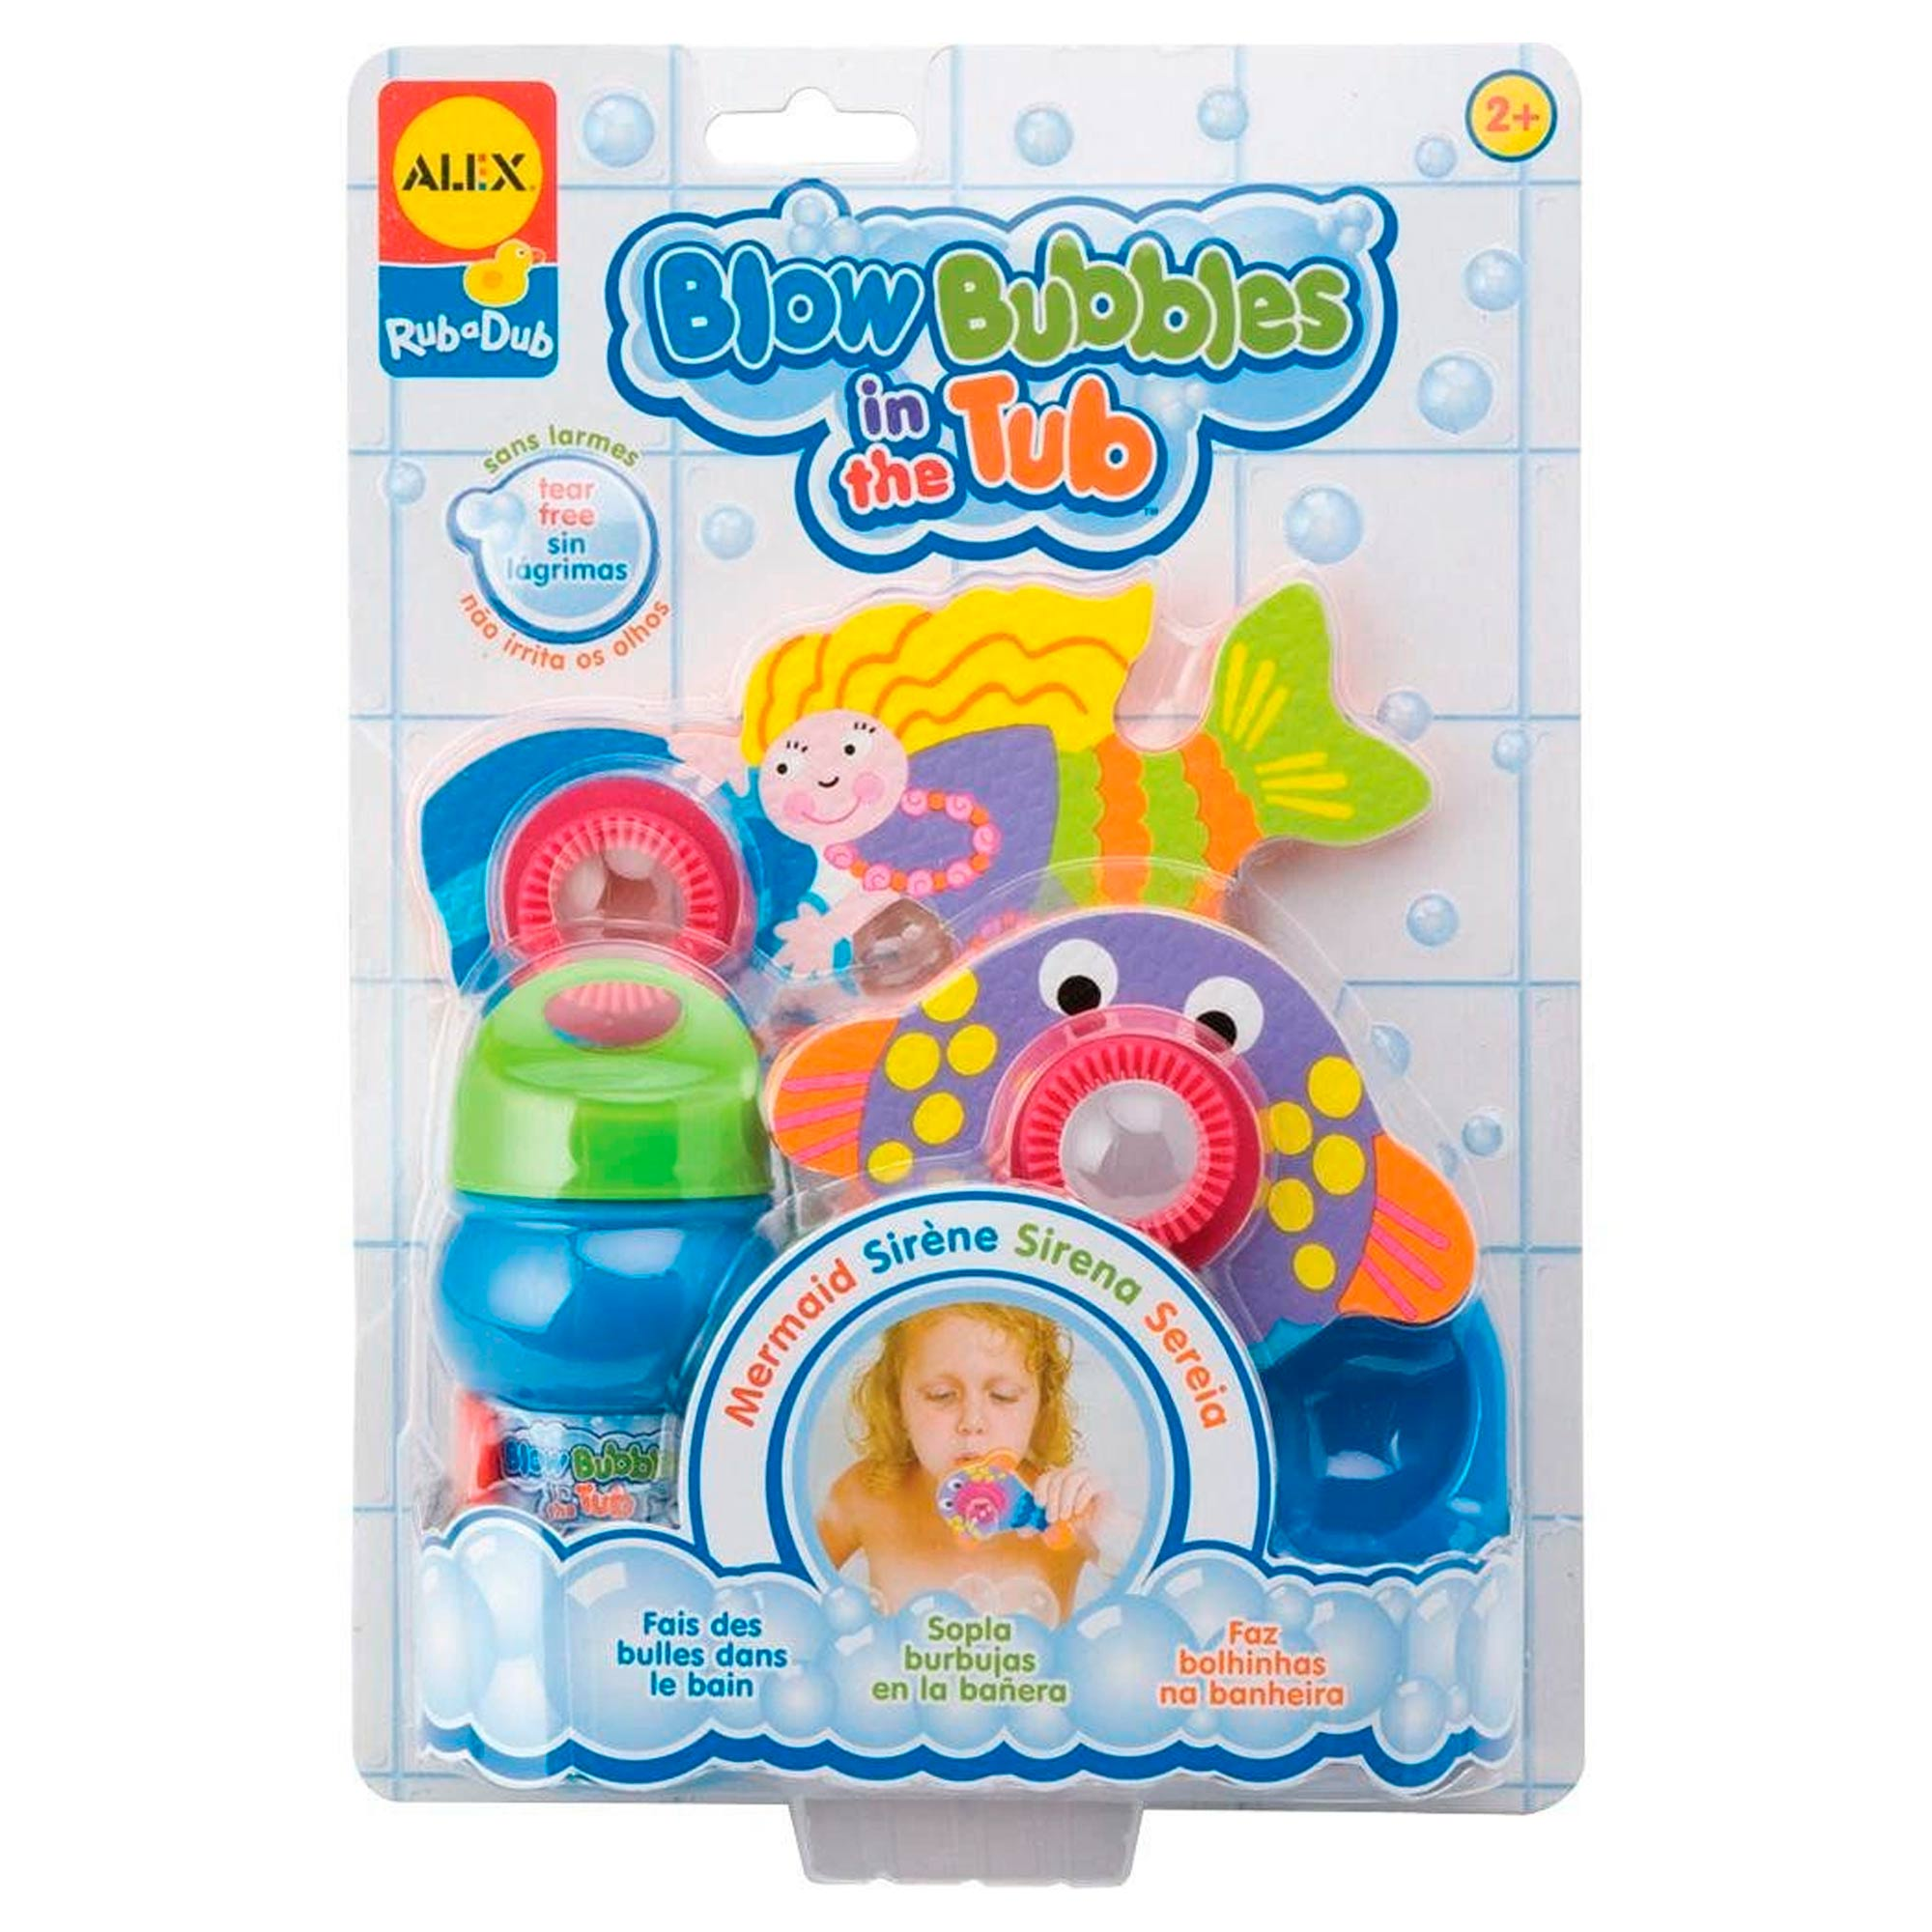 Brinquedos Para Banheira Sereia - Blow Bubbles In The Tub Sereia